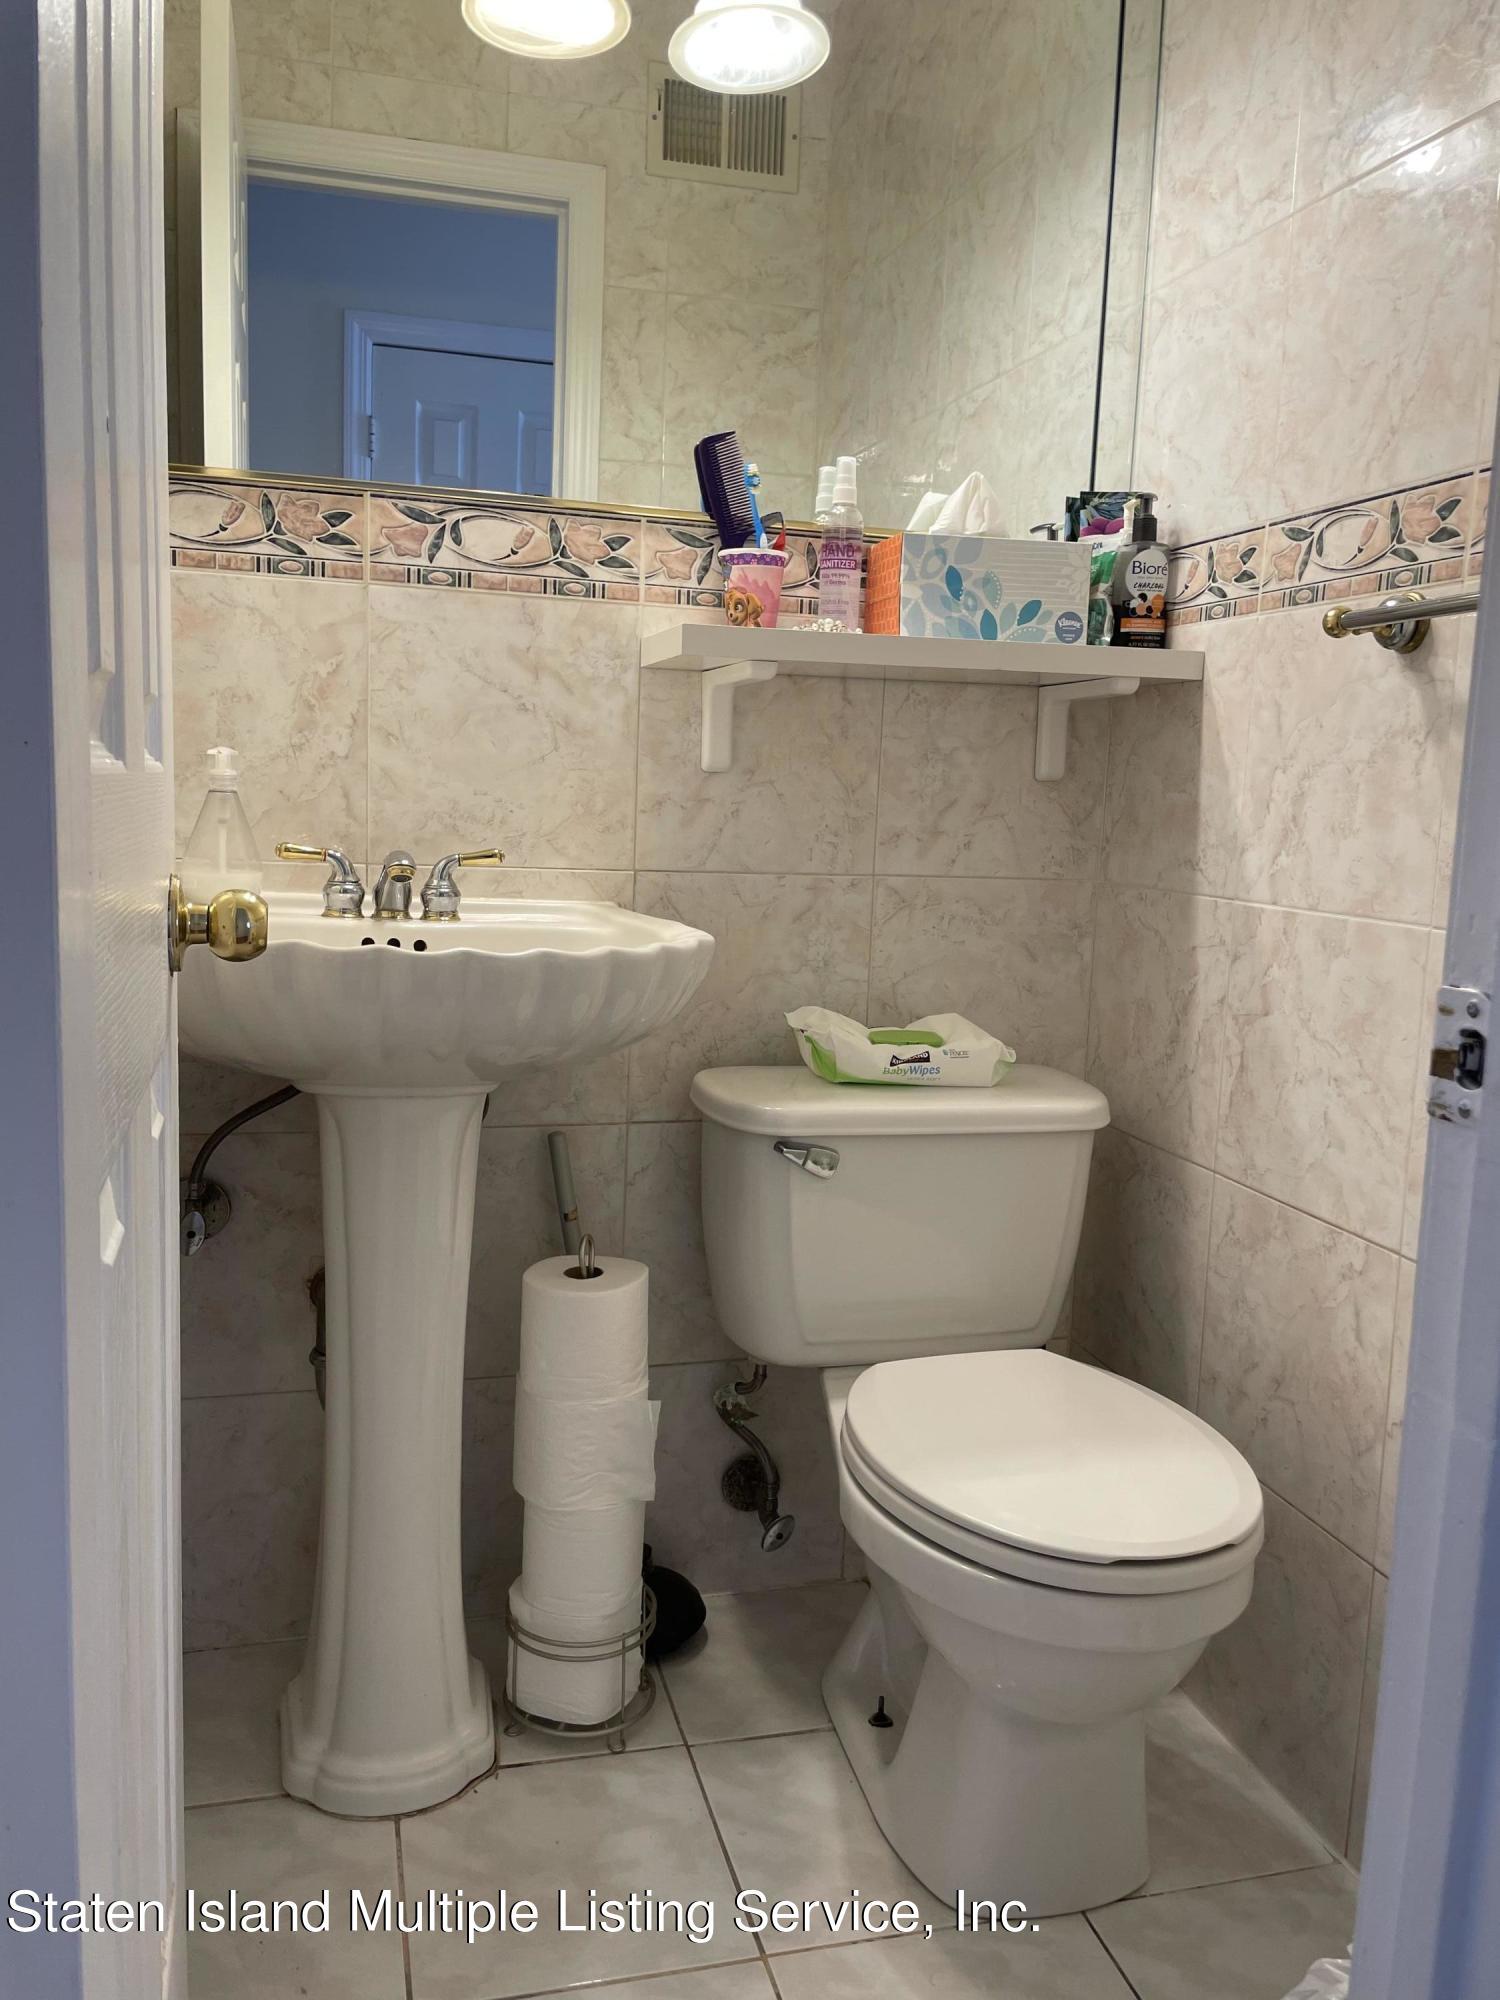 Single Family - Semi-Attached 711 Rockaway Street  Staten Island, NY 10307, MLS-1148604-7